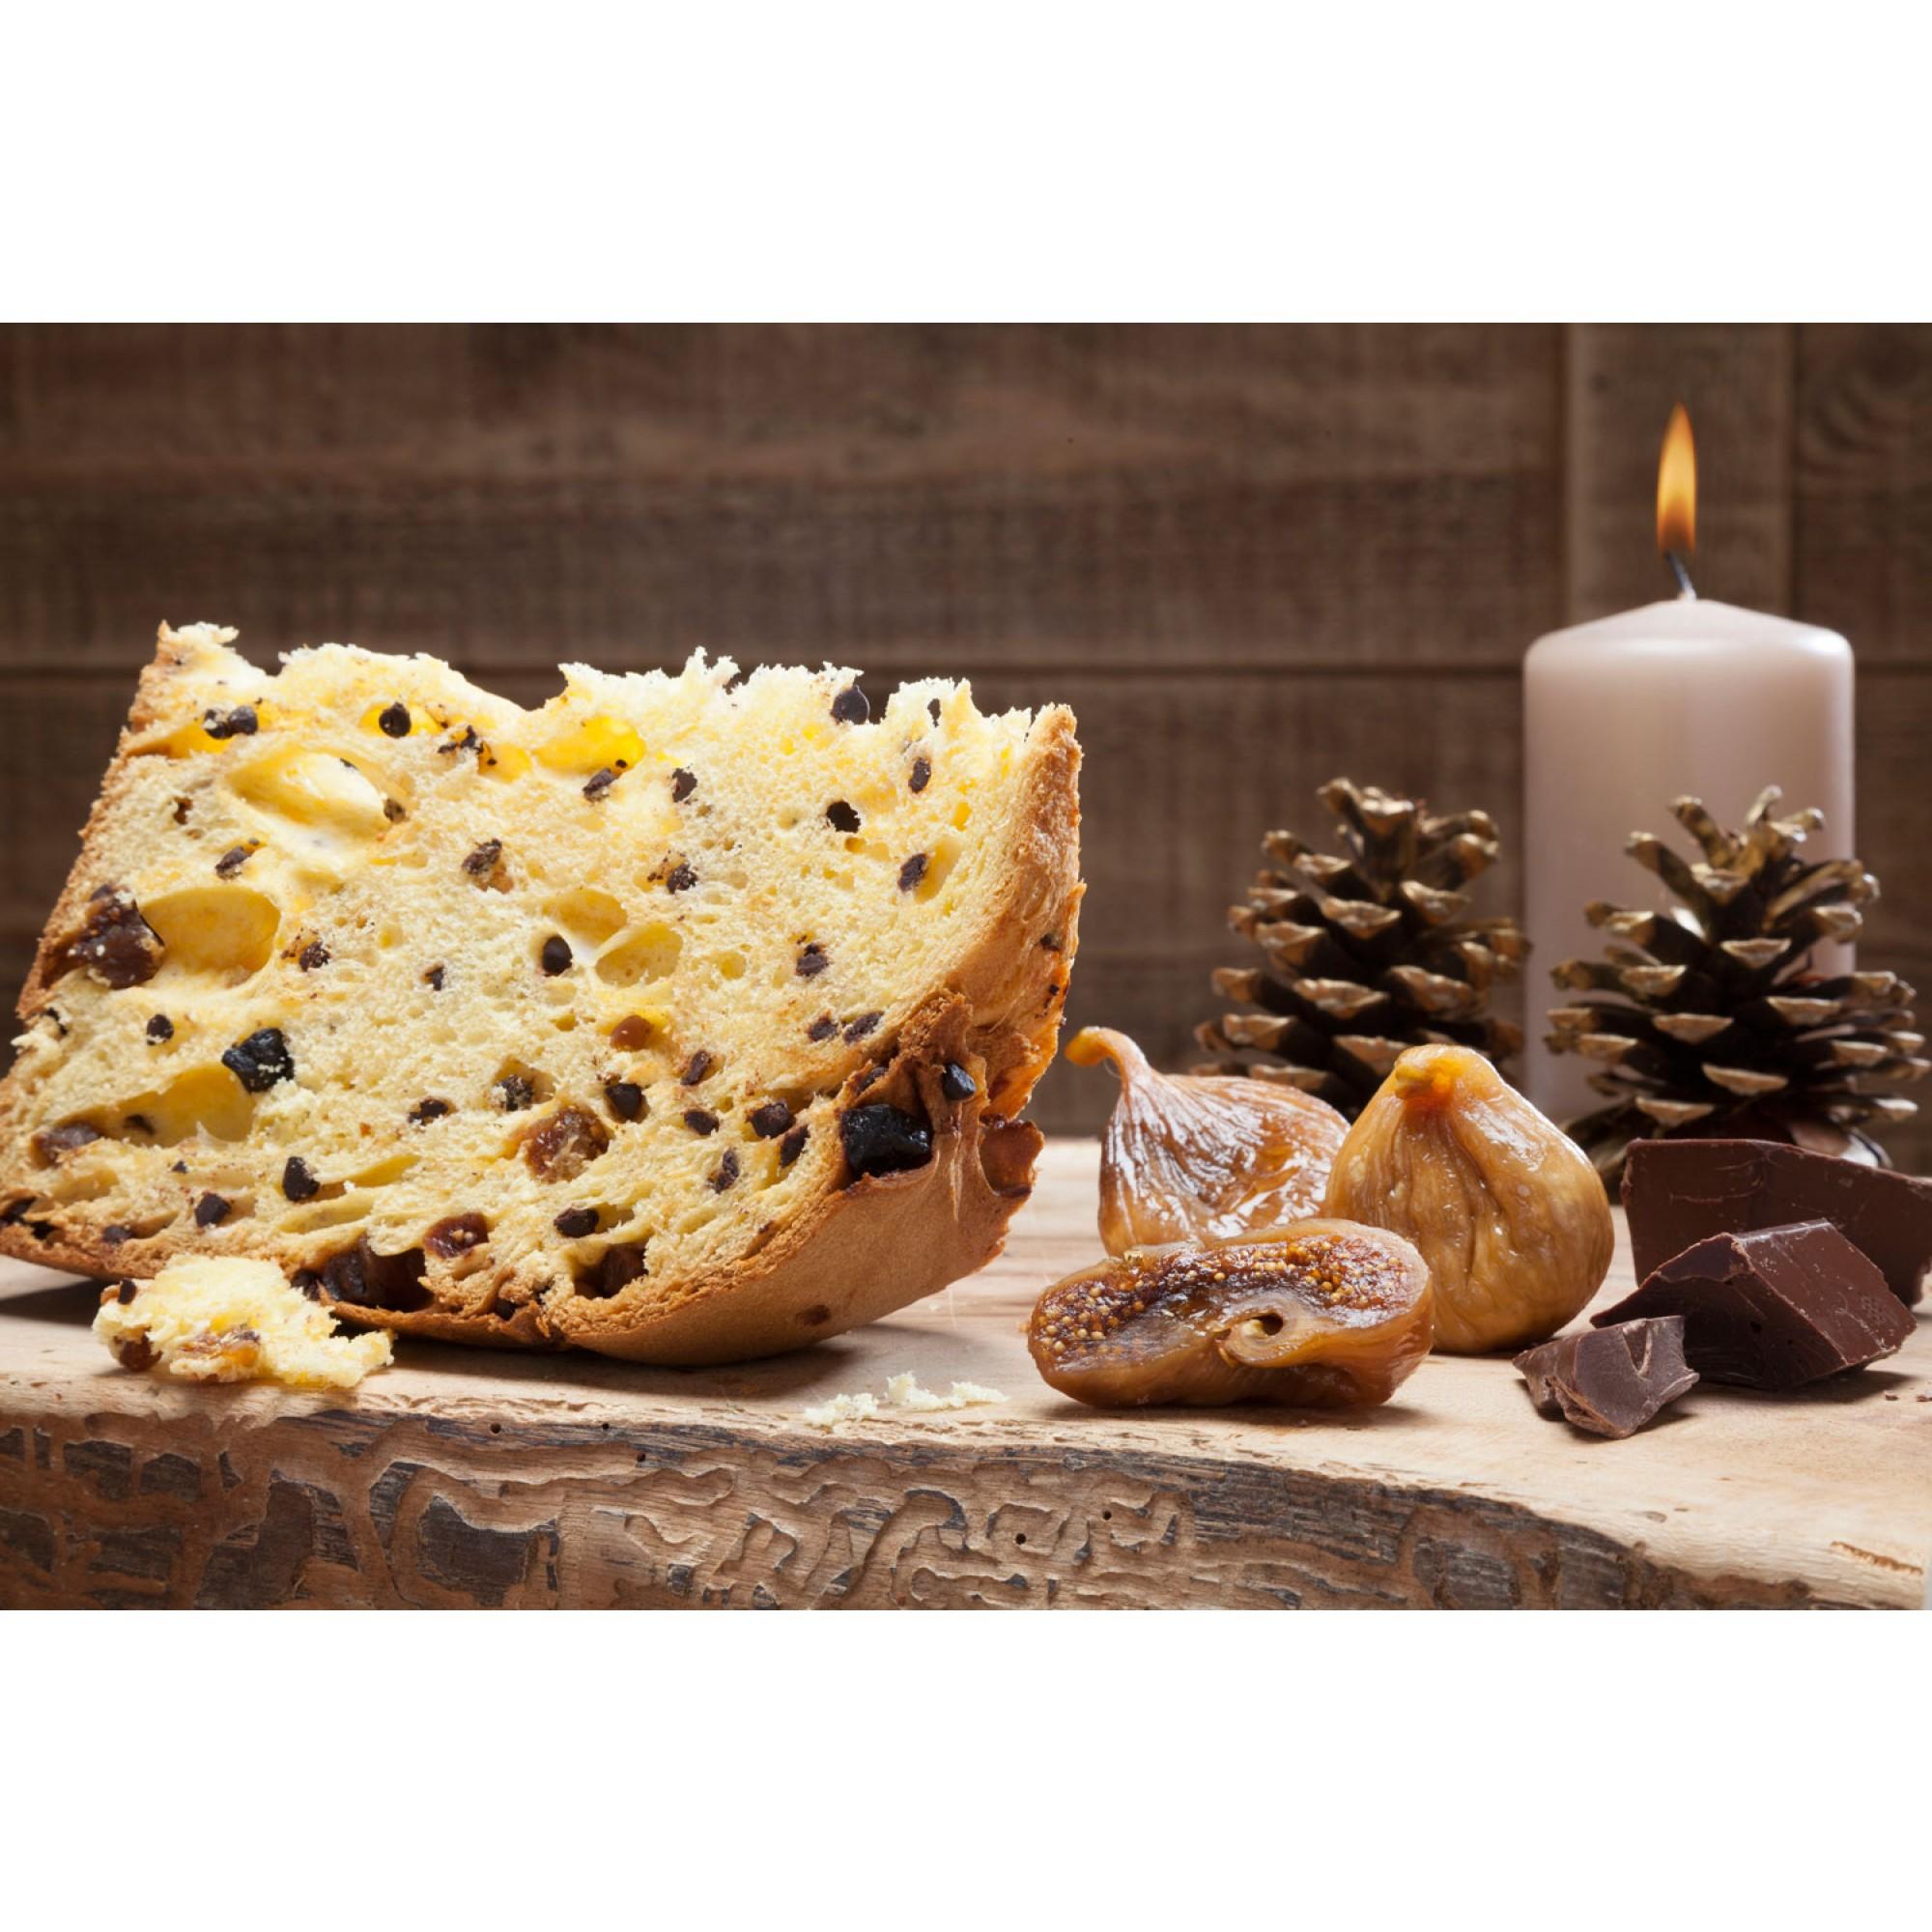 Panettone artigianale cioccofichi dettaglio